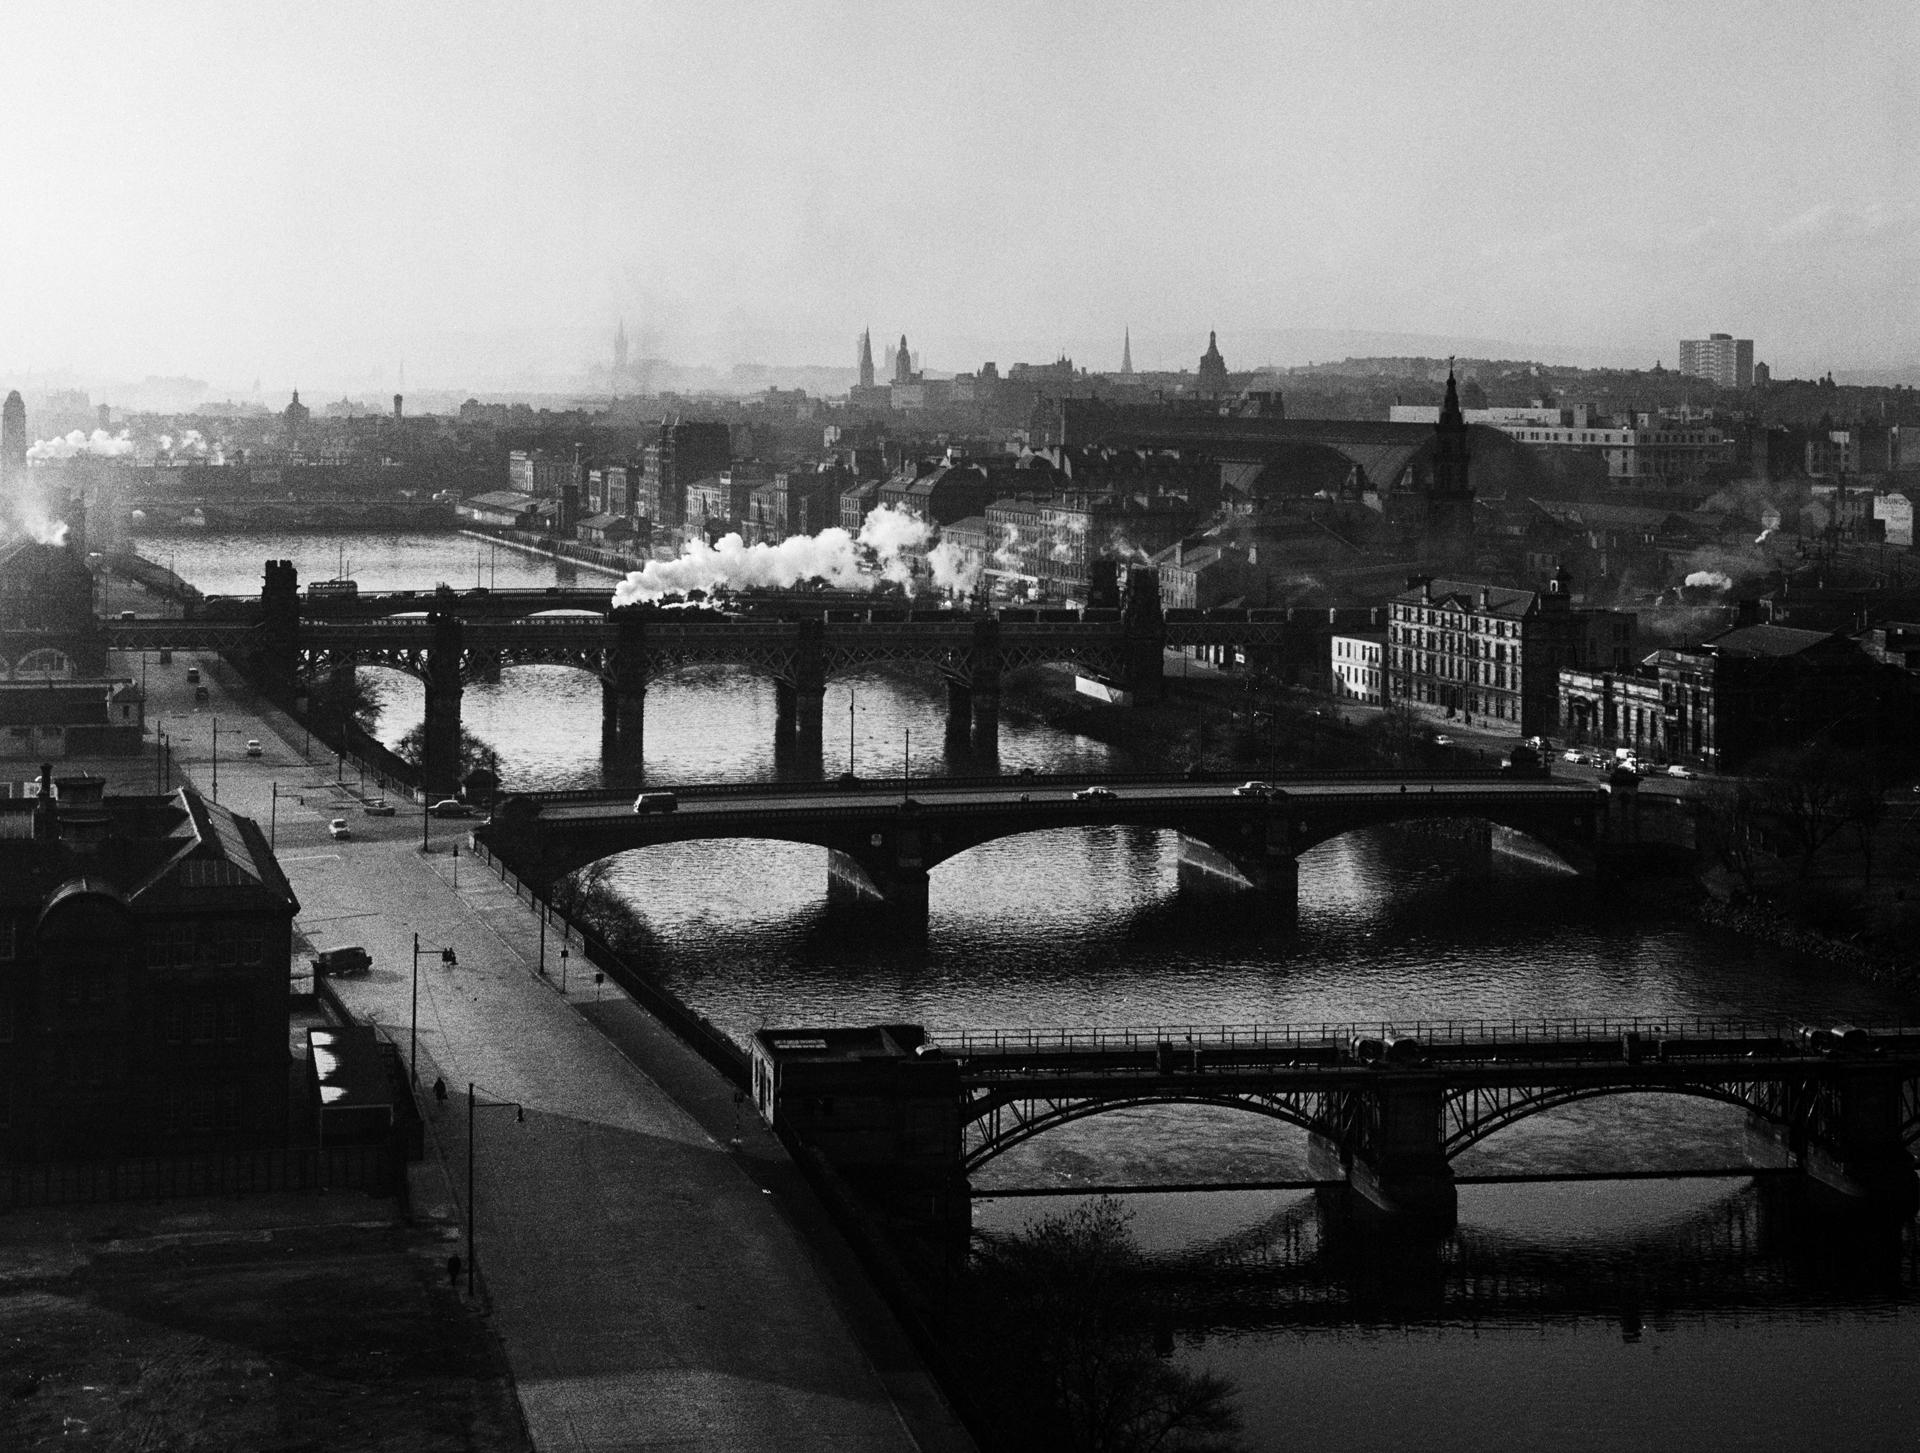 Image of Bridges over the River Clyde (1963) by Oscar Marzaroli